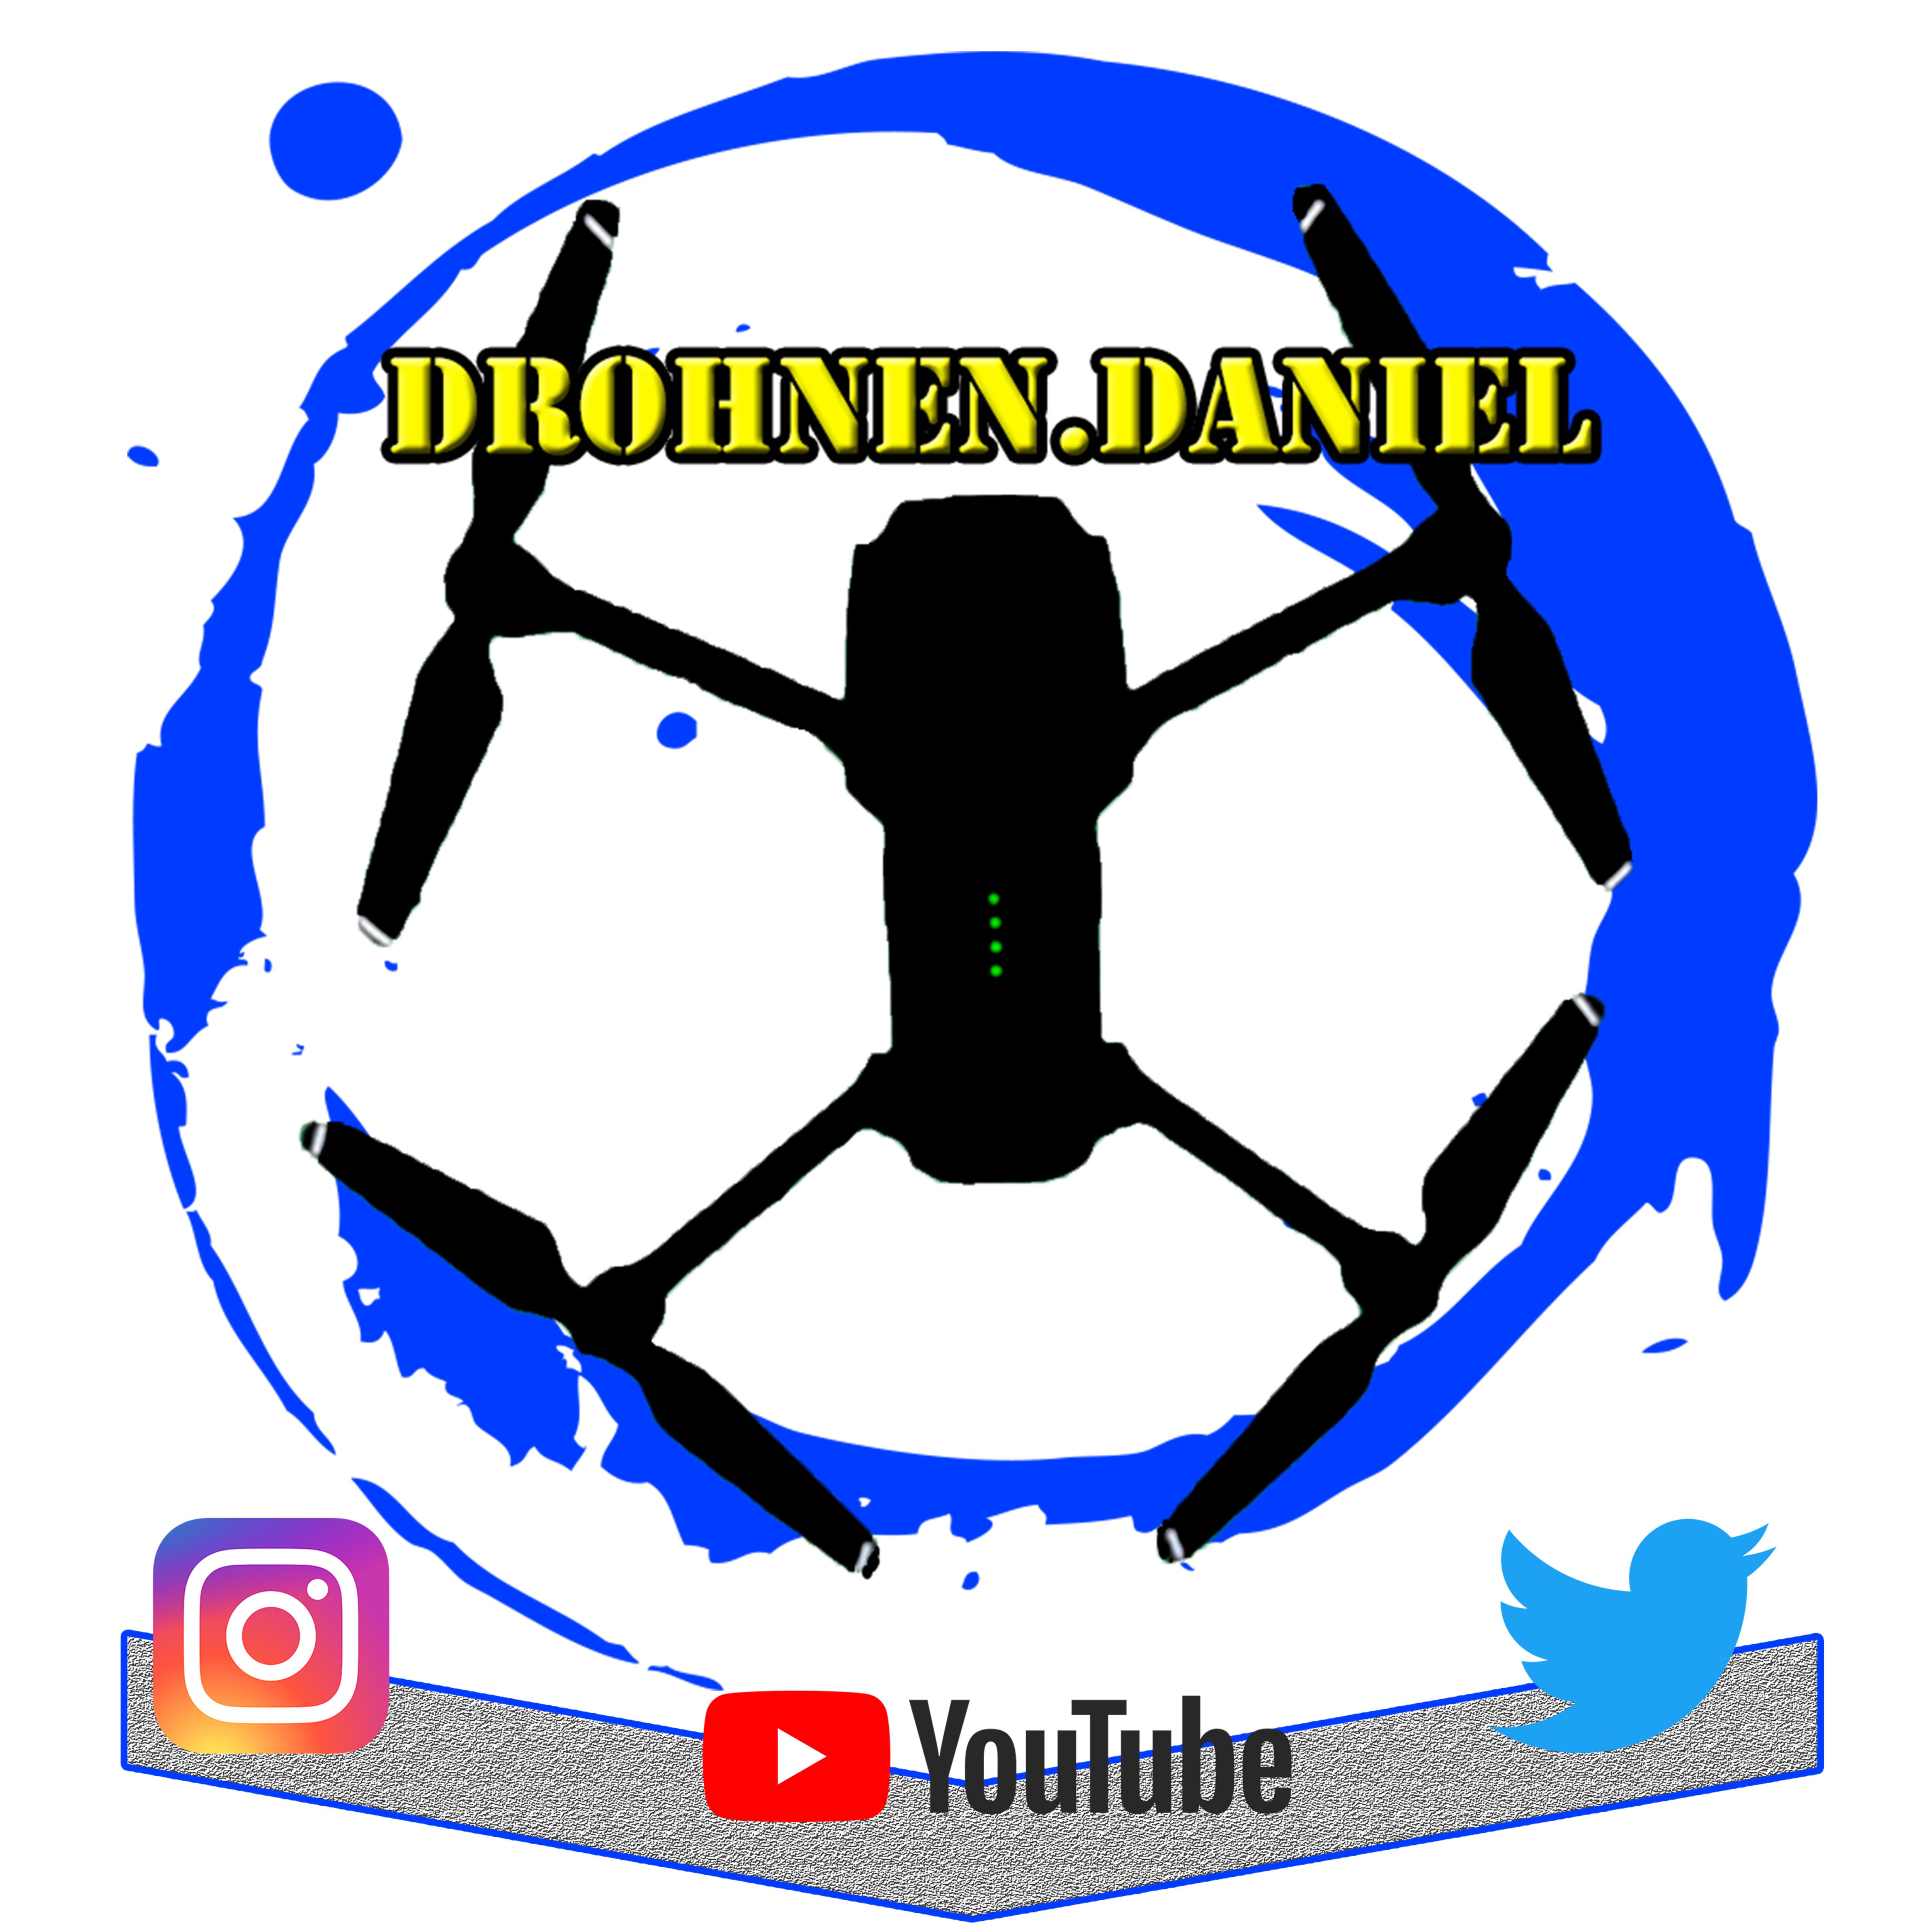 DROHNEN.DANIEL